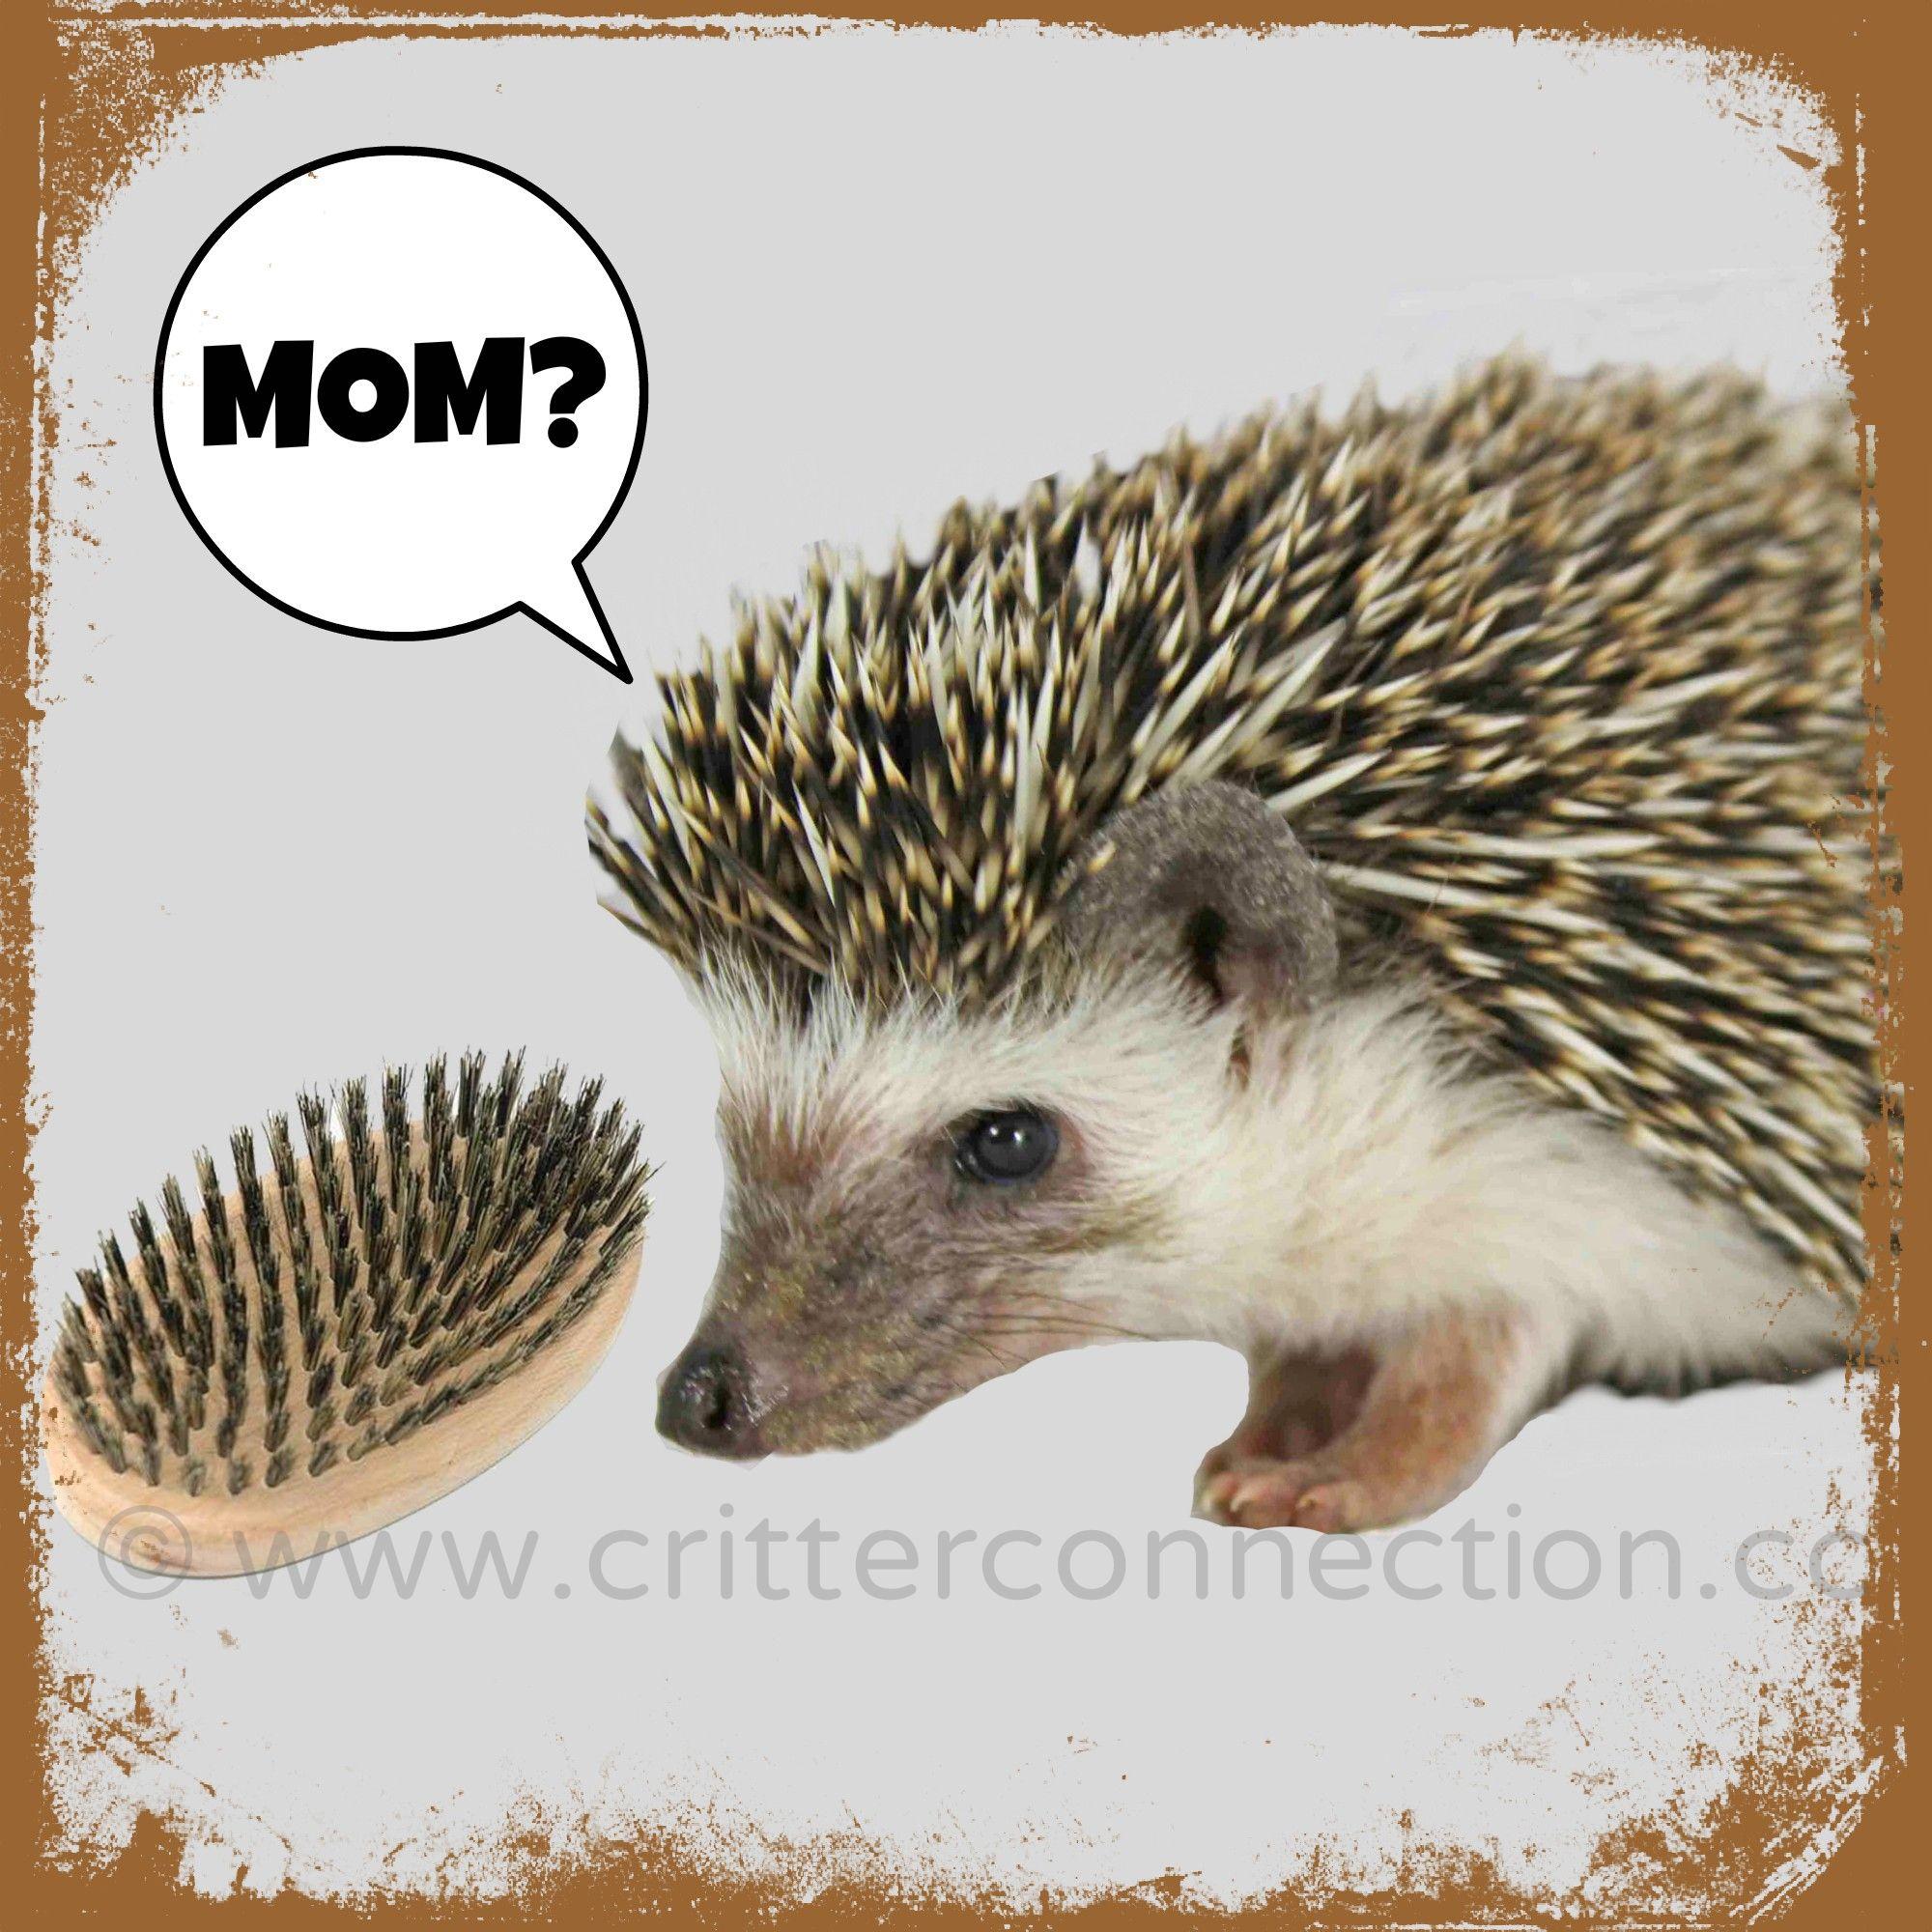 7655ed1bb hedgehog #hedgie #funny #lol #quills #brush #cute #adorable #mom ...